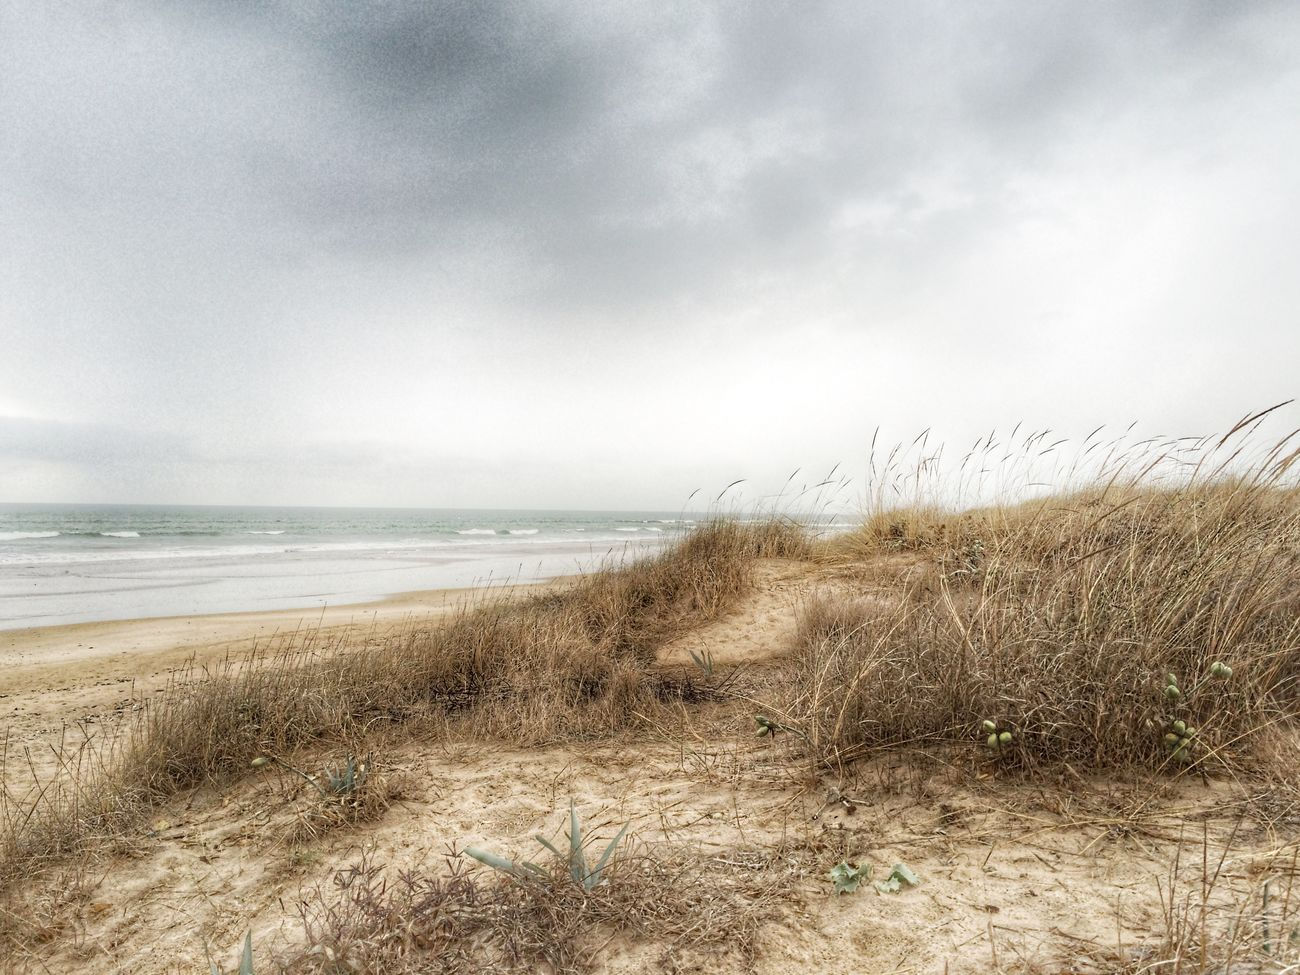 Grises Clouds And Sky Sea Landscape Nature_collection AMPt_community EyeEm Best Edits EyeEm Best Shots Landscape_Collection